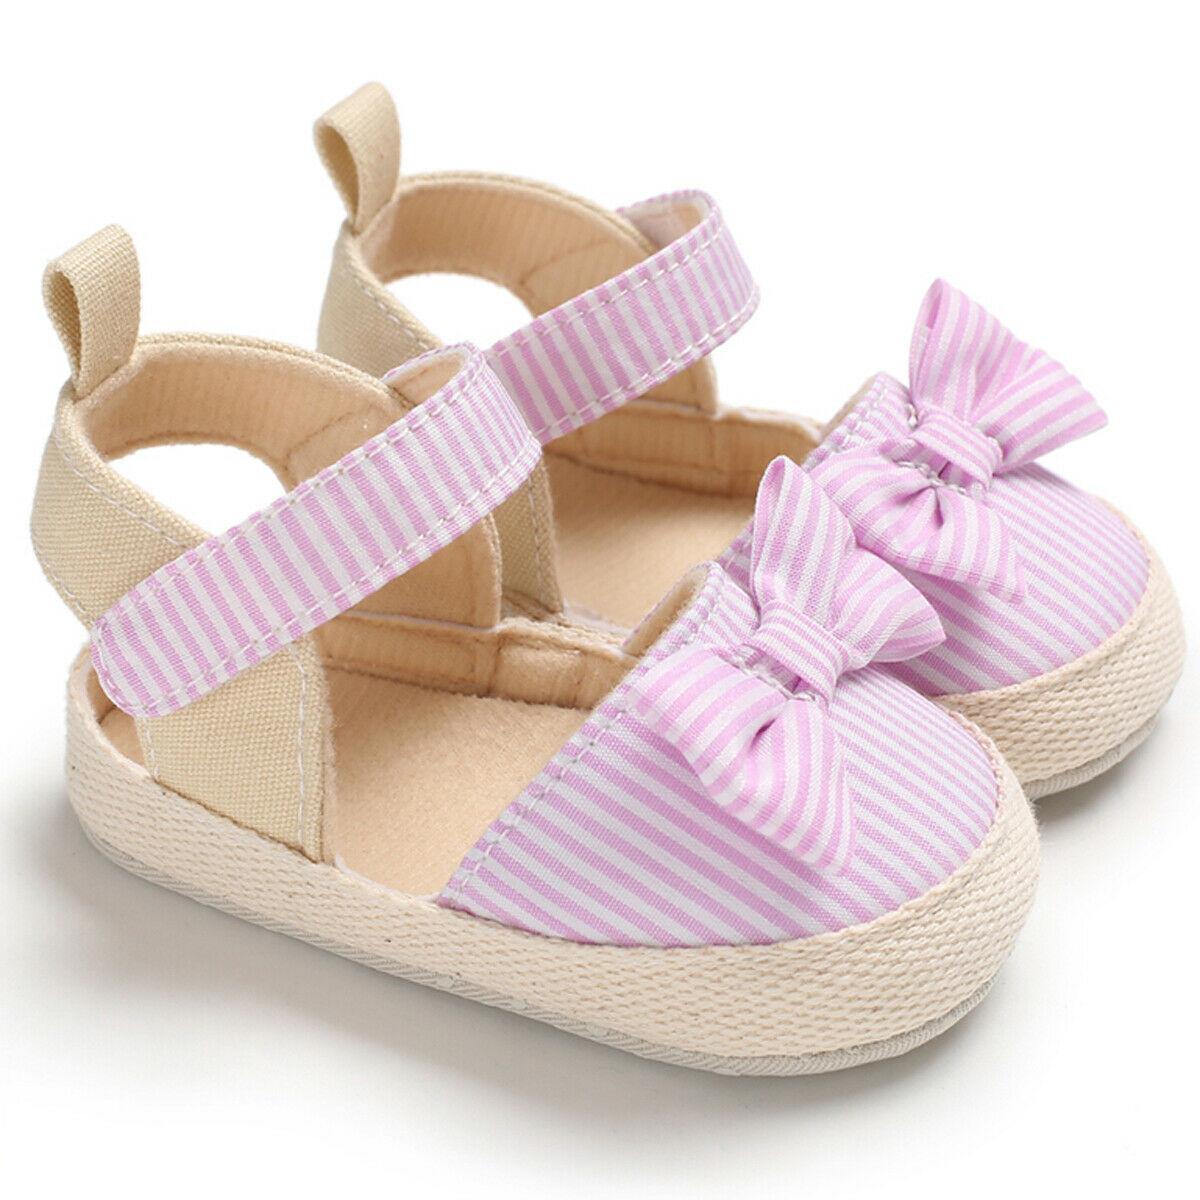 2019 Newborn Baby Girl Soft Crib Shoes Infants Anti-slip Sneaker Prewalker 0-18M